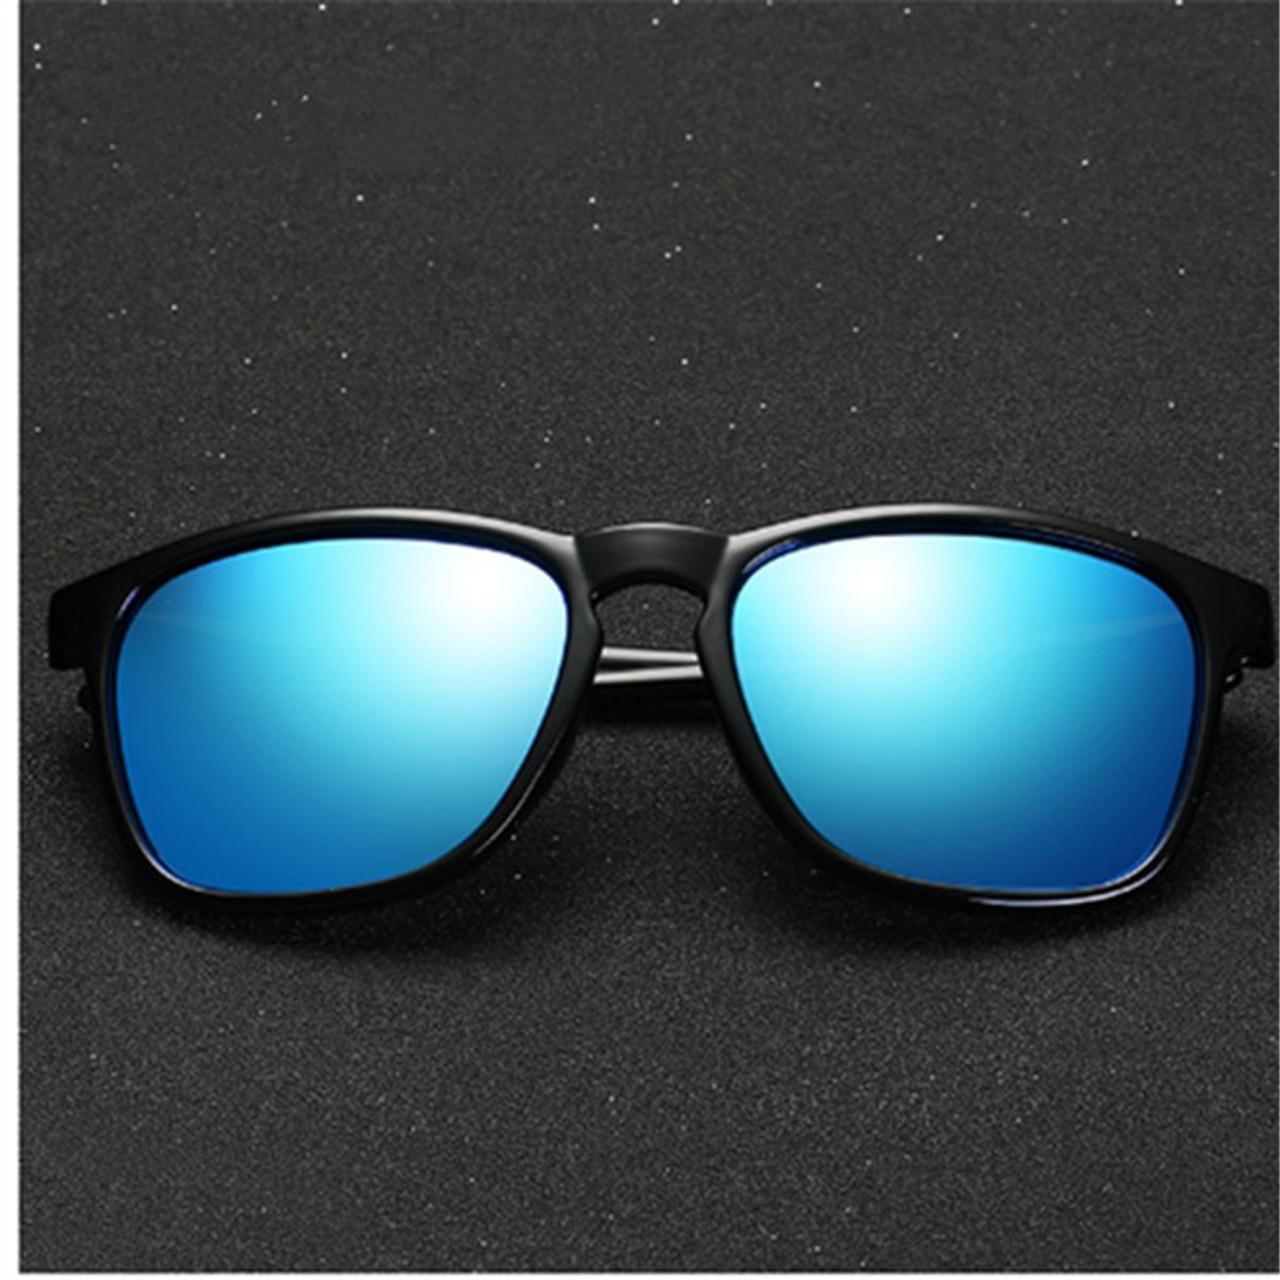 431a00a0855 ... Driving Sunglasses Men Polarized Sunglasses Masculine Glasses UV400  Goggles Shades Fashion Sun Glasses Women ...